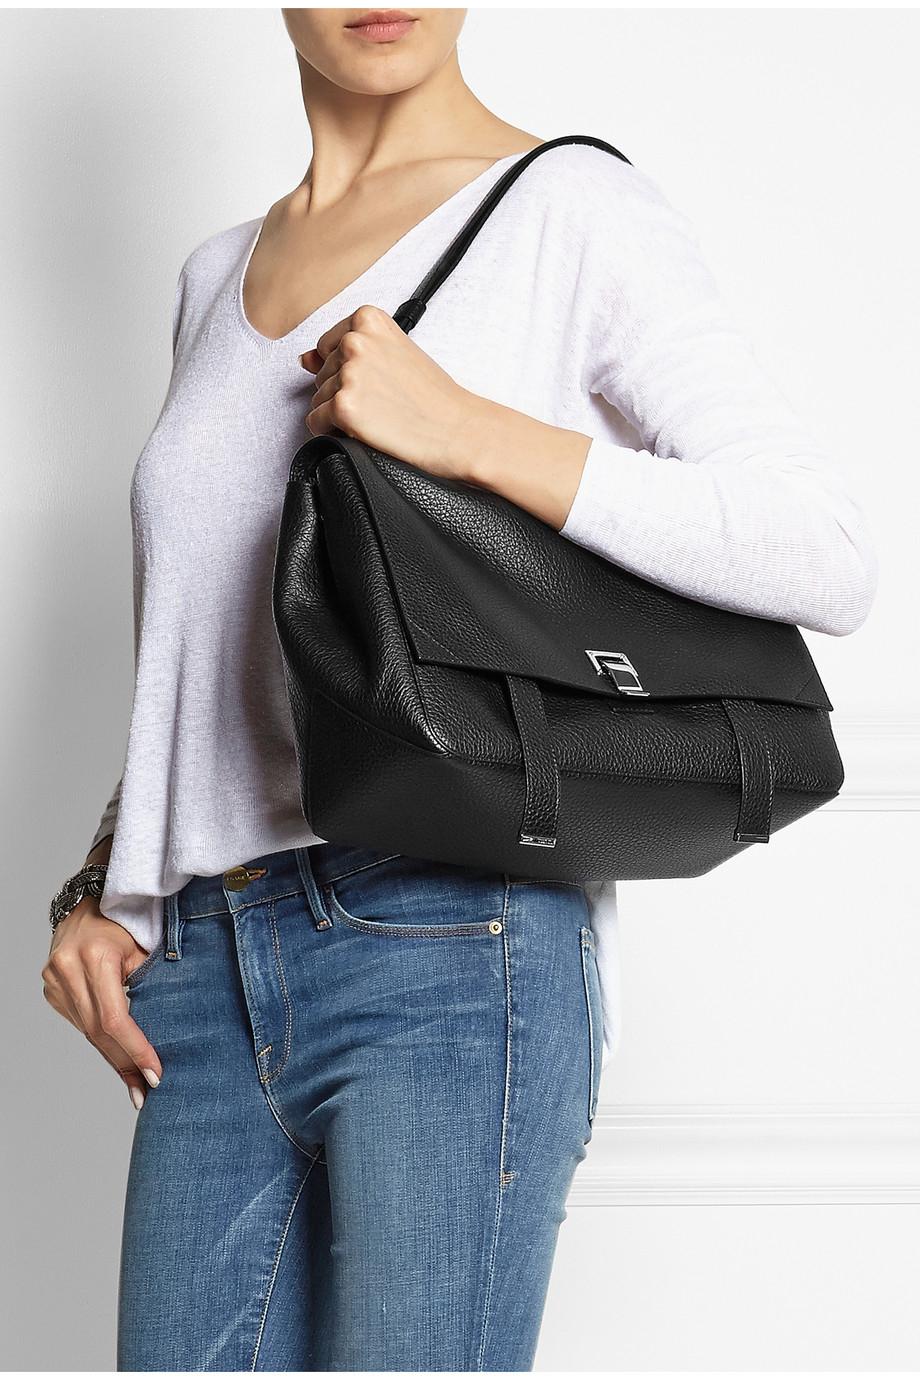 Ps Courier Large Textured Leather Shoulder Bag